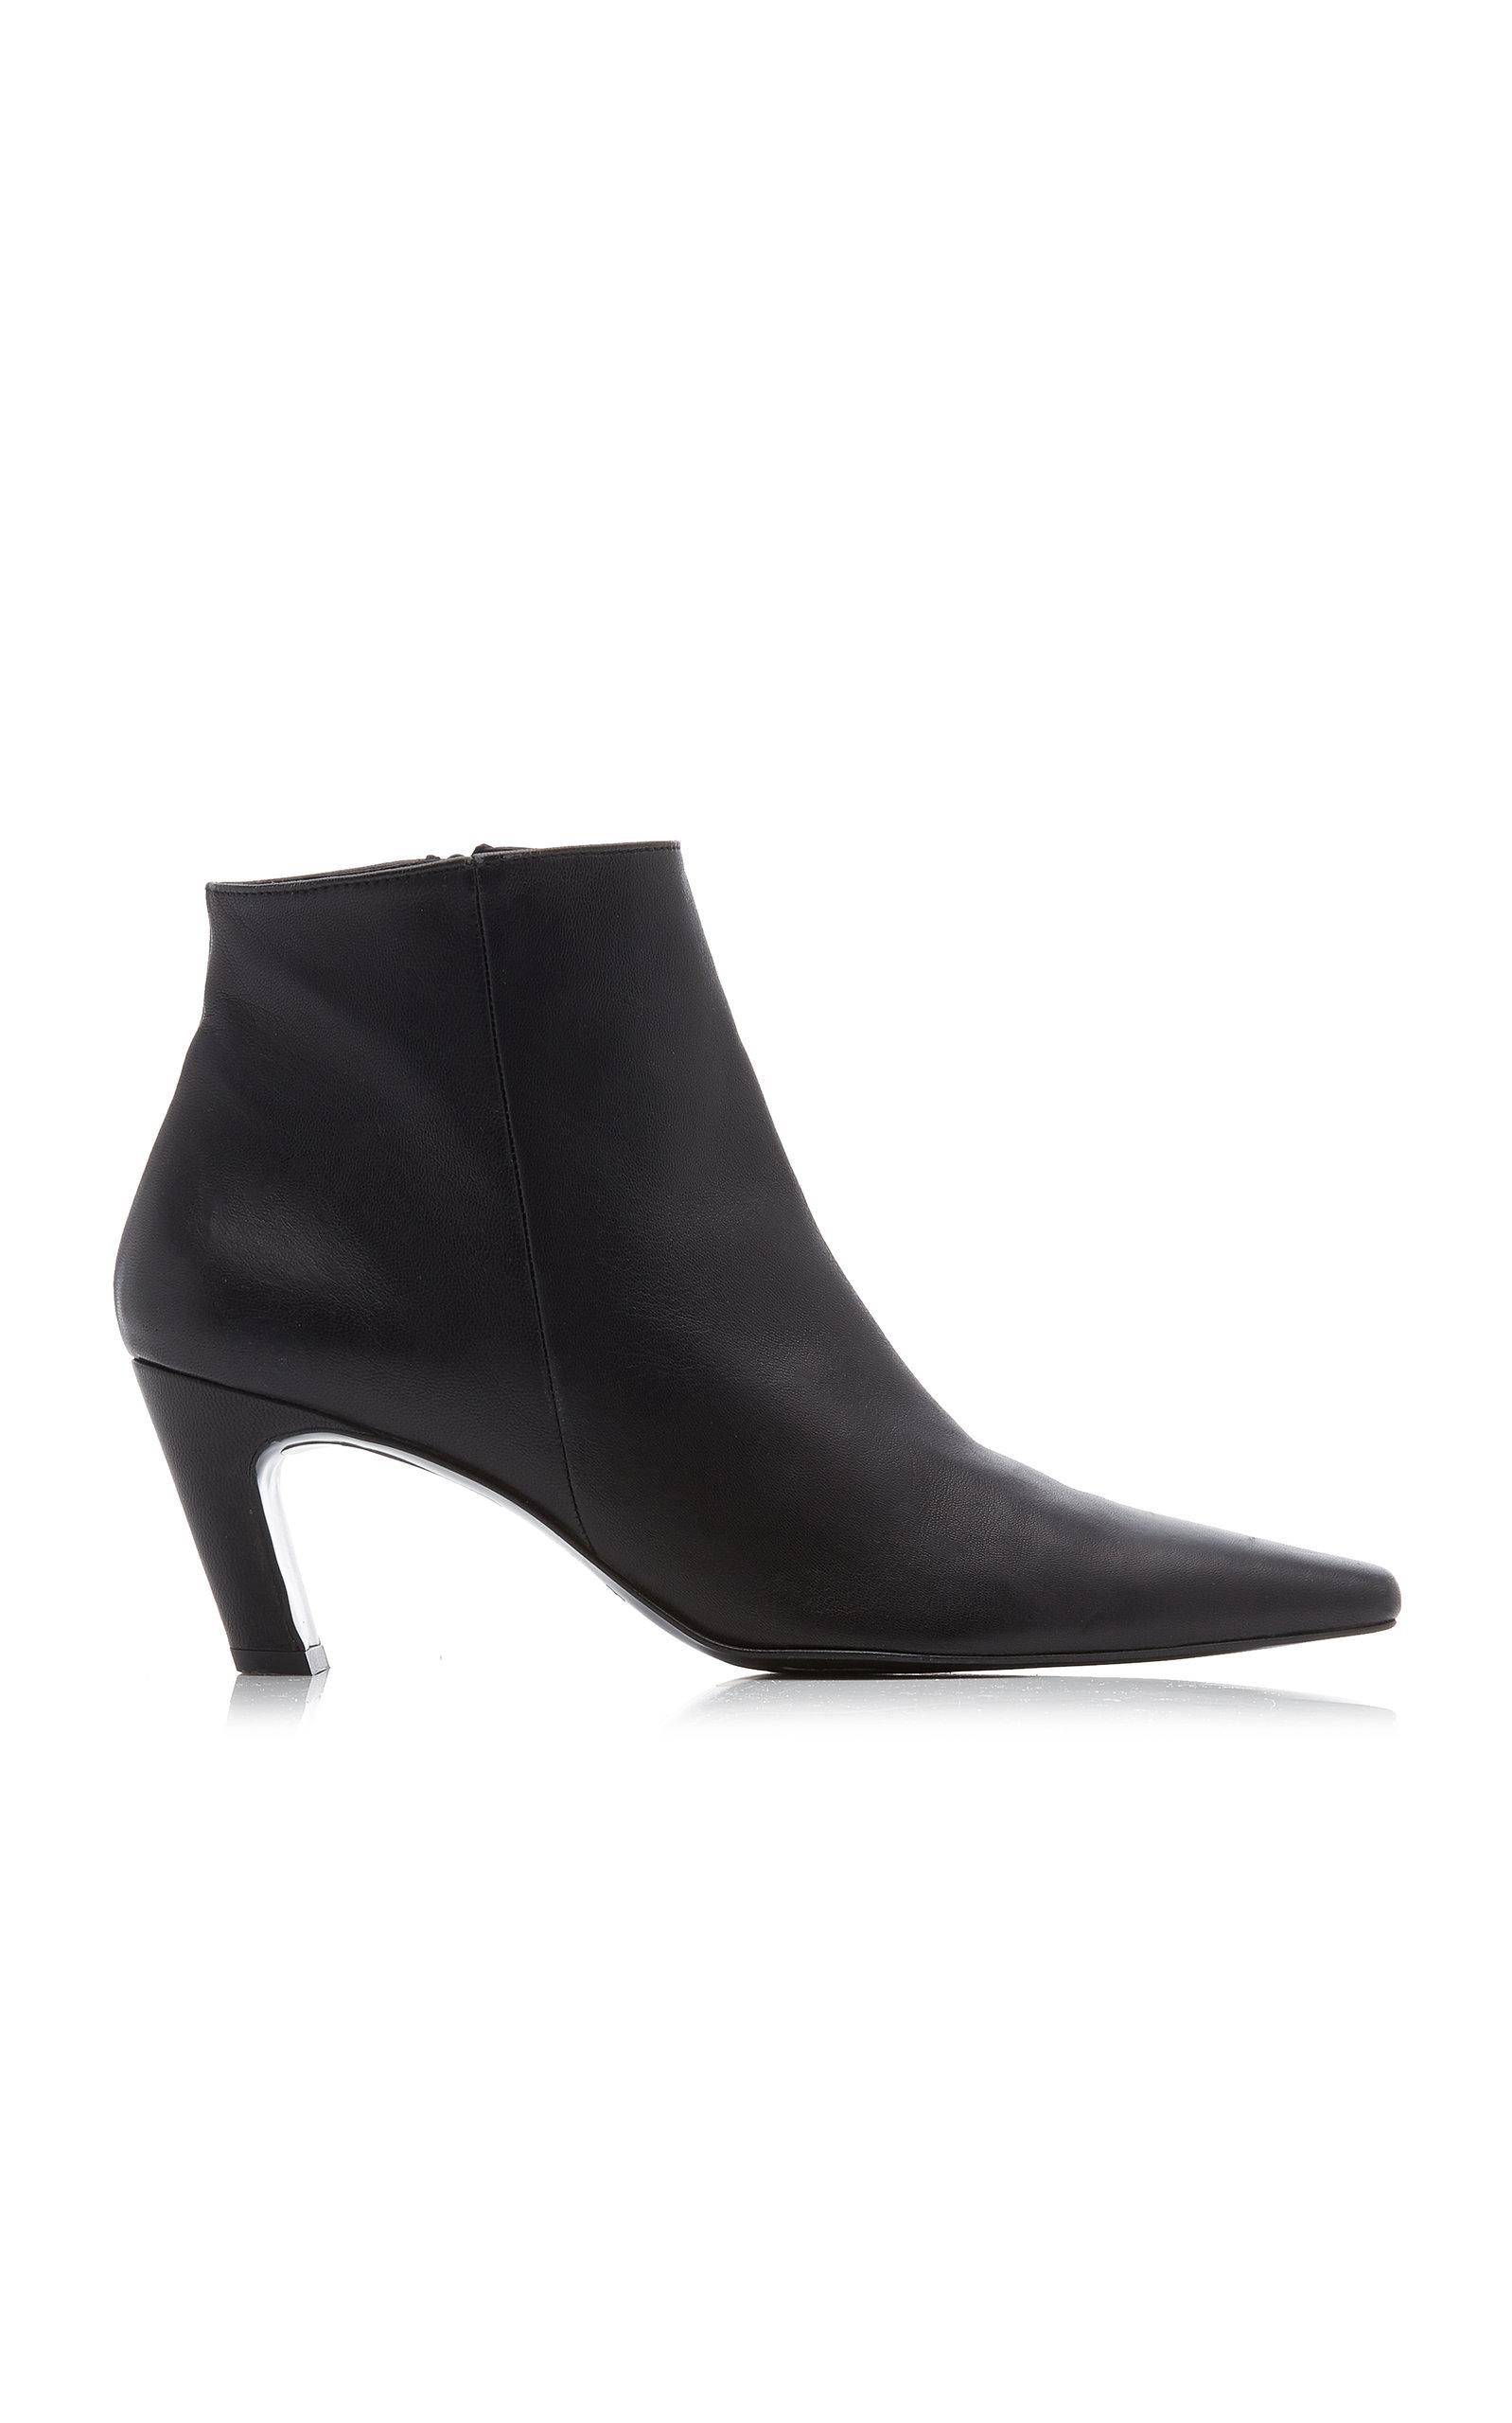 Flattered - Women's Xenia Leather Ankle Boots - Black/red - Moda Operandi